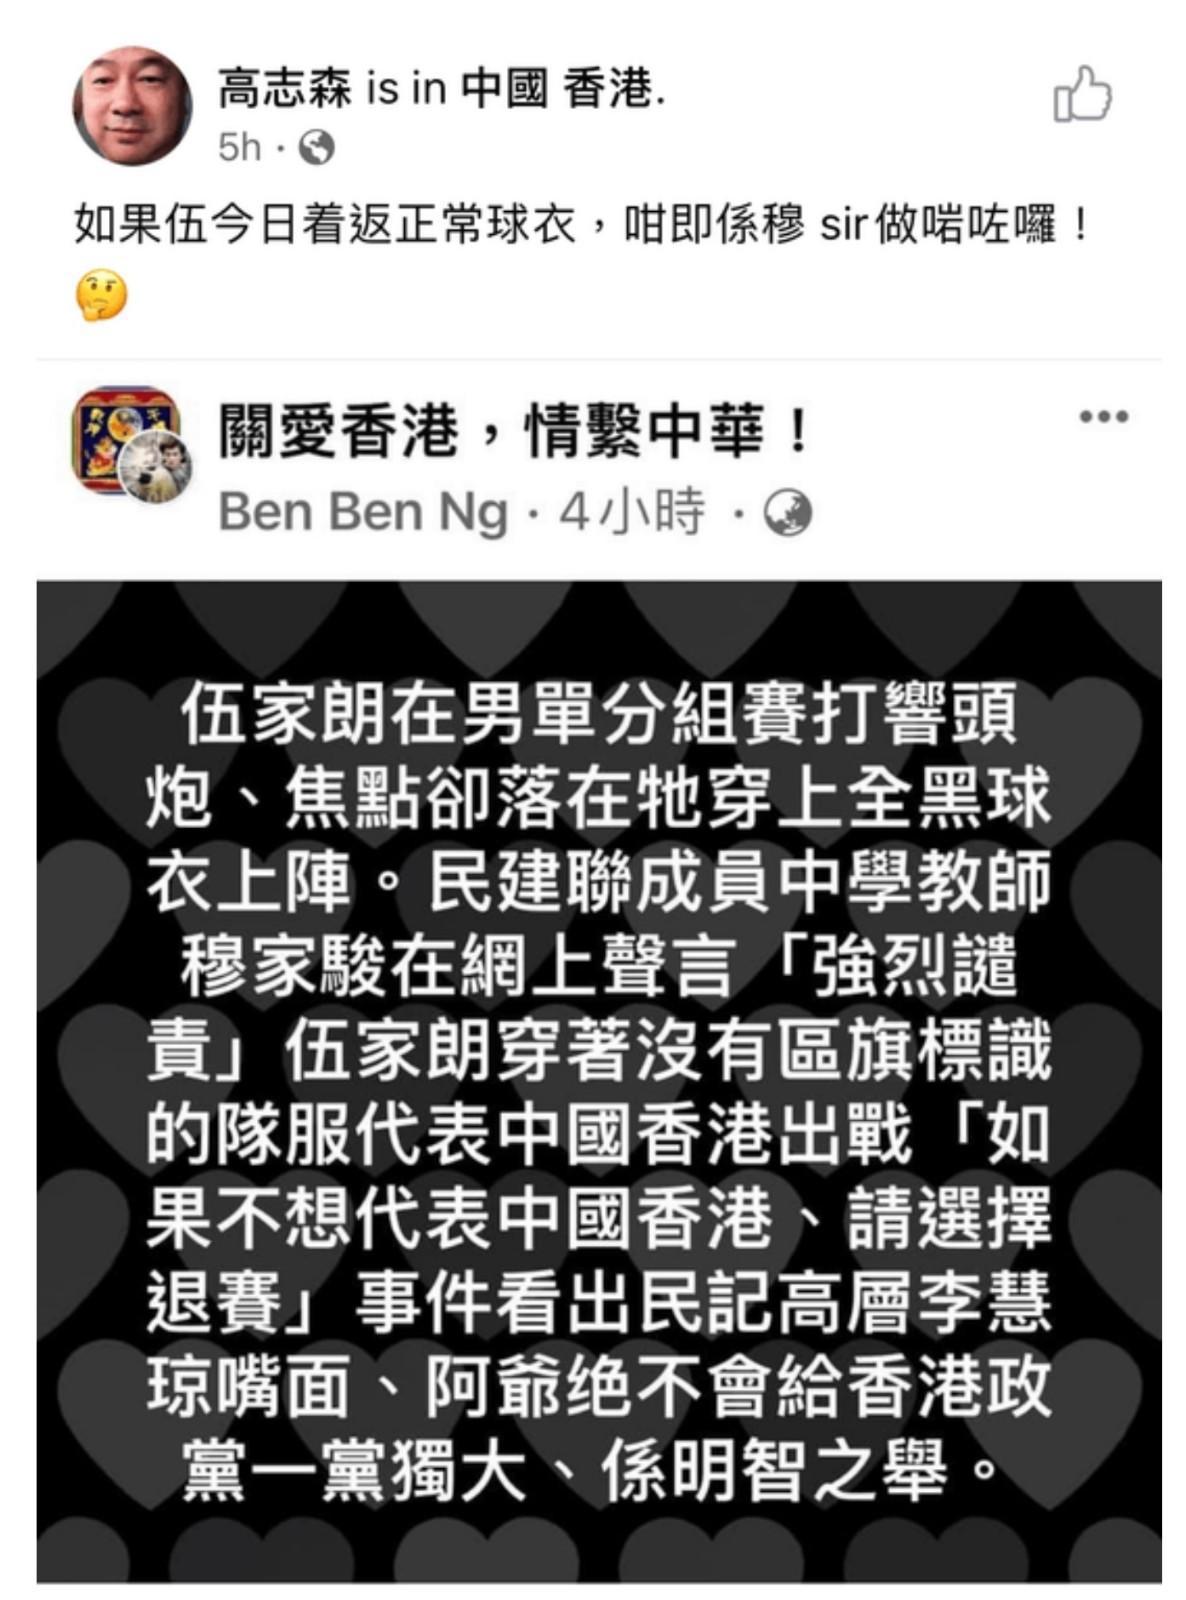 https://upload.hkgolden.media/comment/t1thqxrp.1iq3gvk244p.rxi5rr24b02.c20.jpg